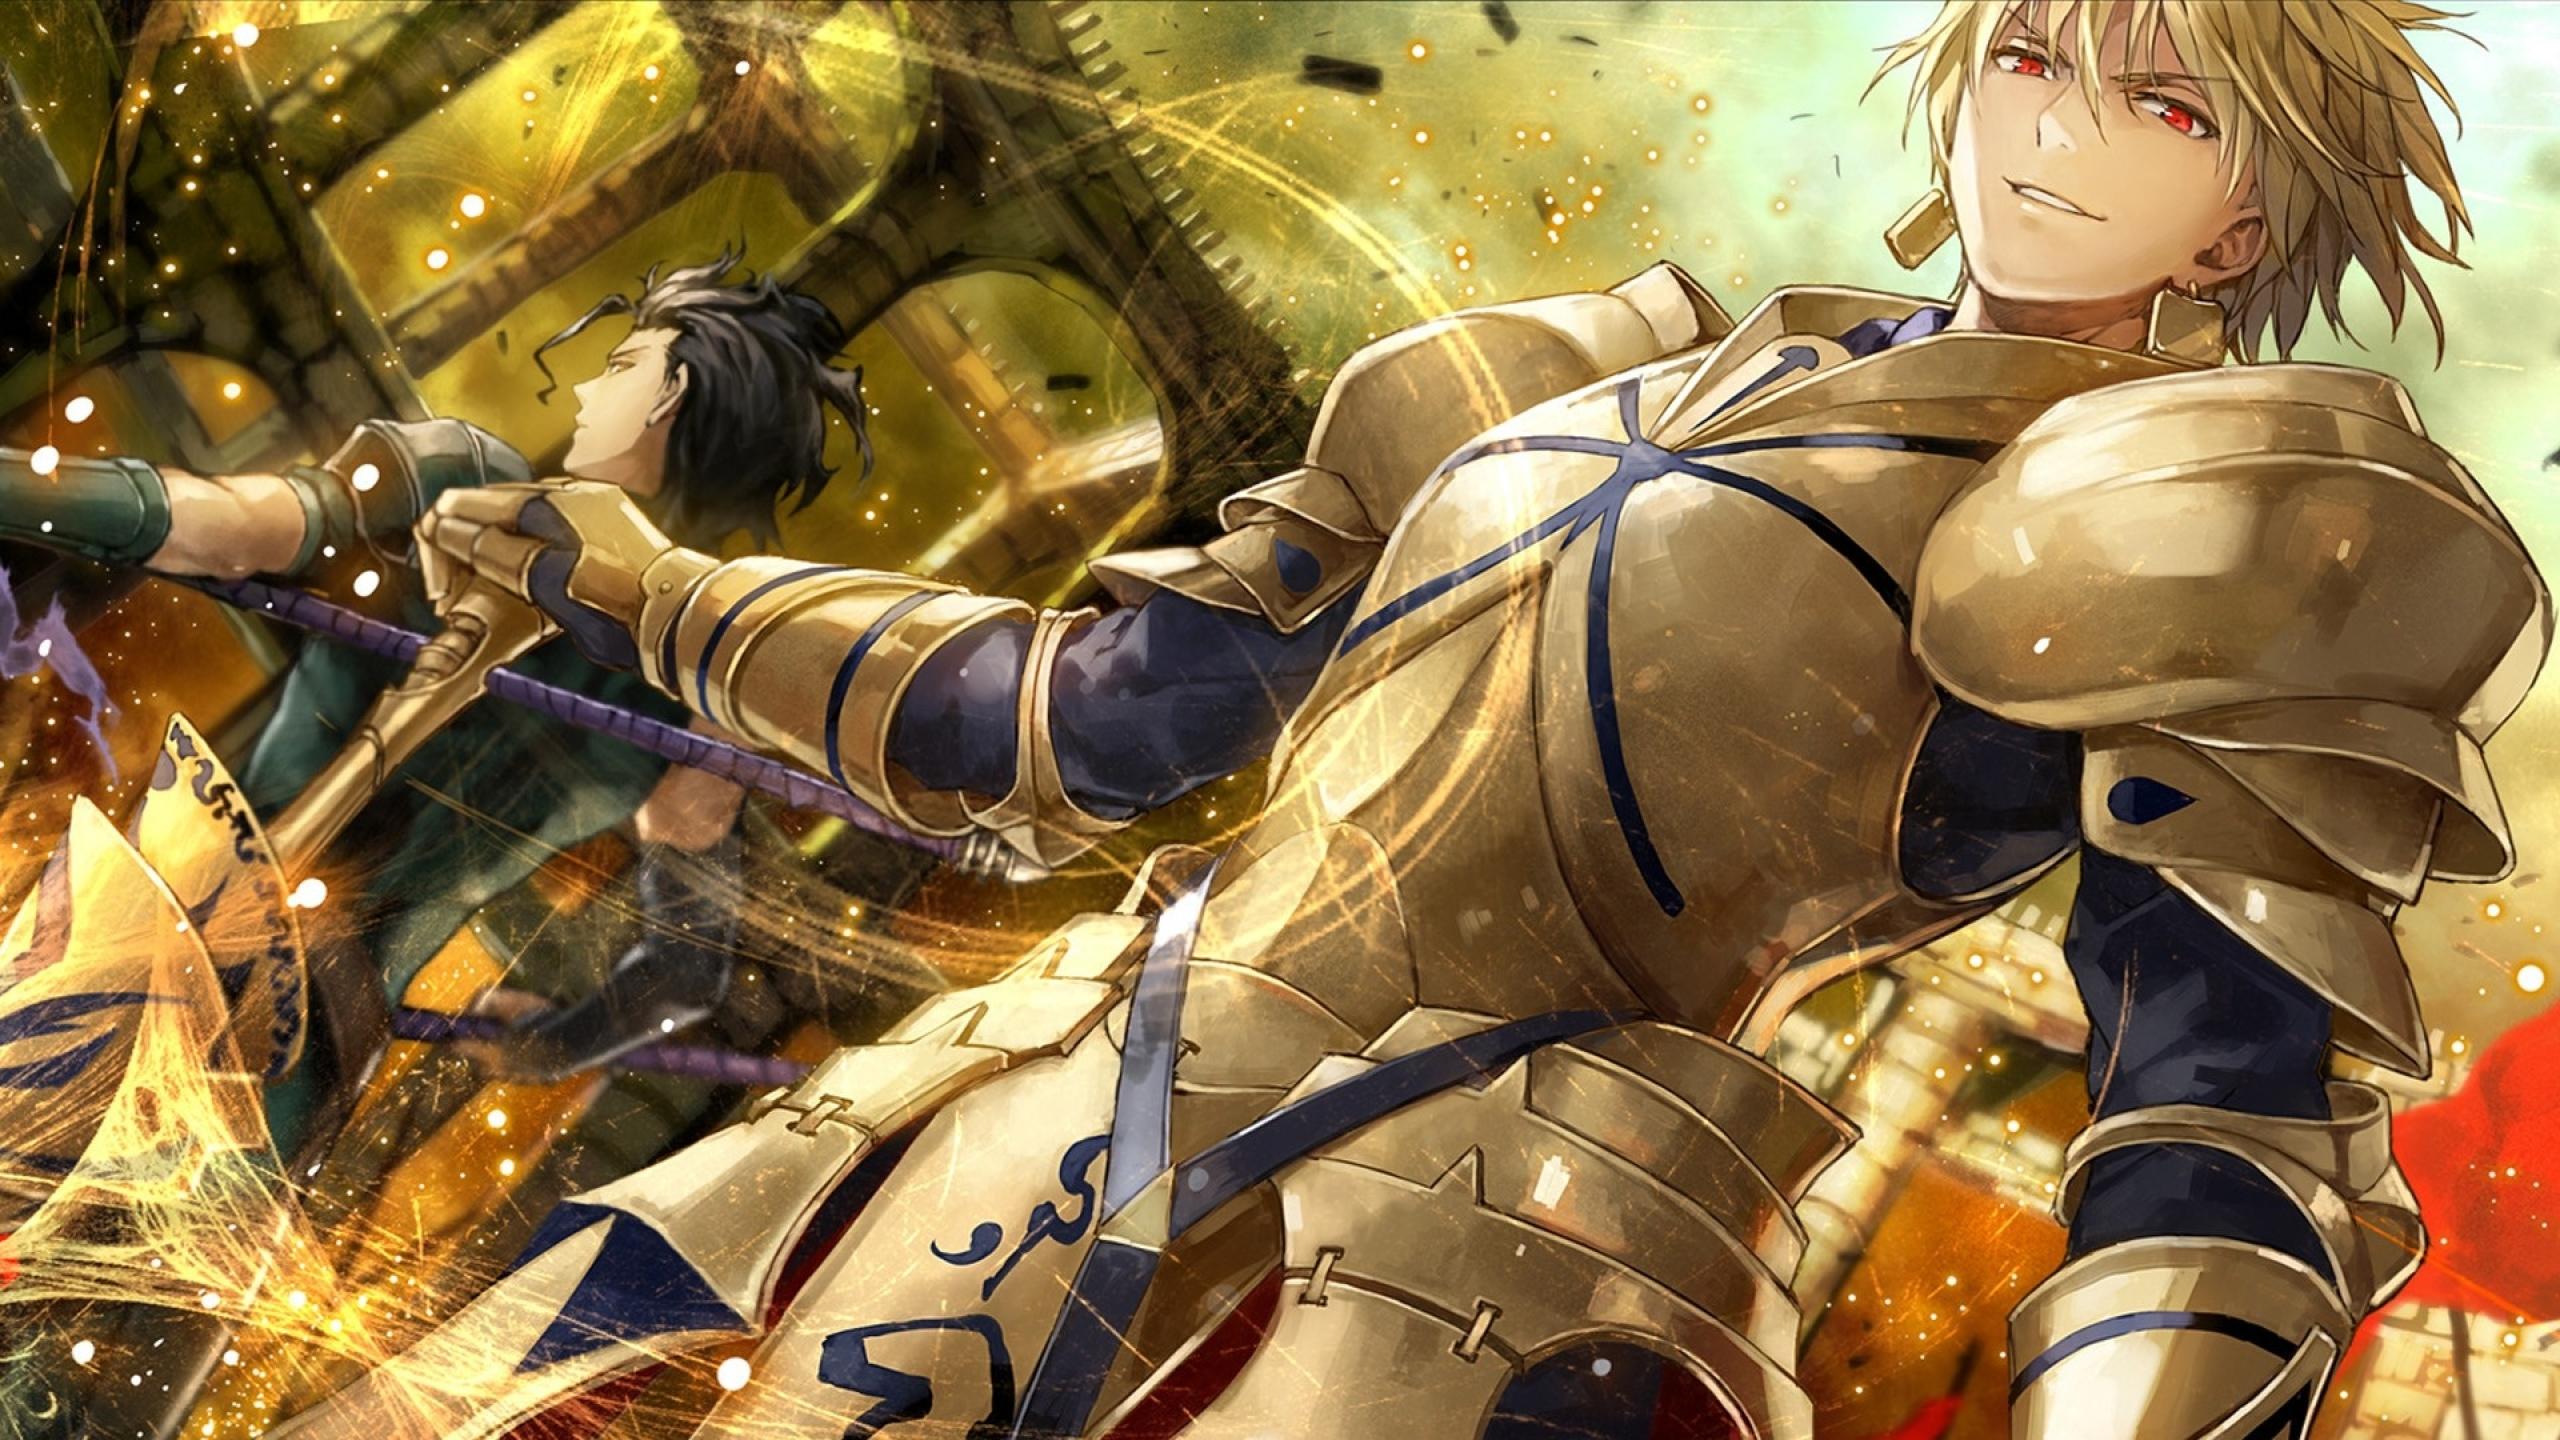 fate series archer fatezero 1920x1080 wallpaper Anime HD WallpaperHi 2560x1440